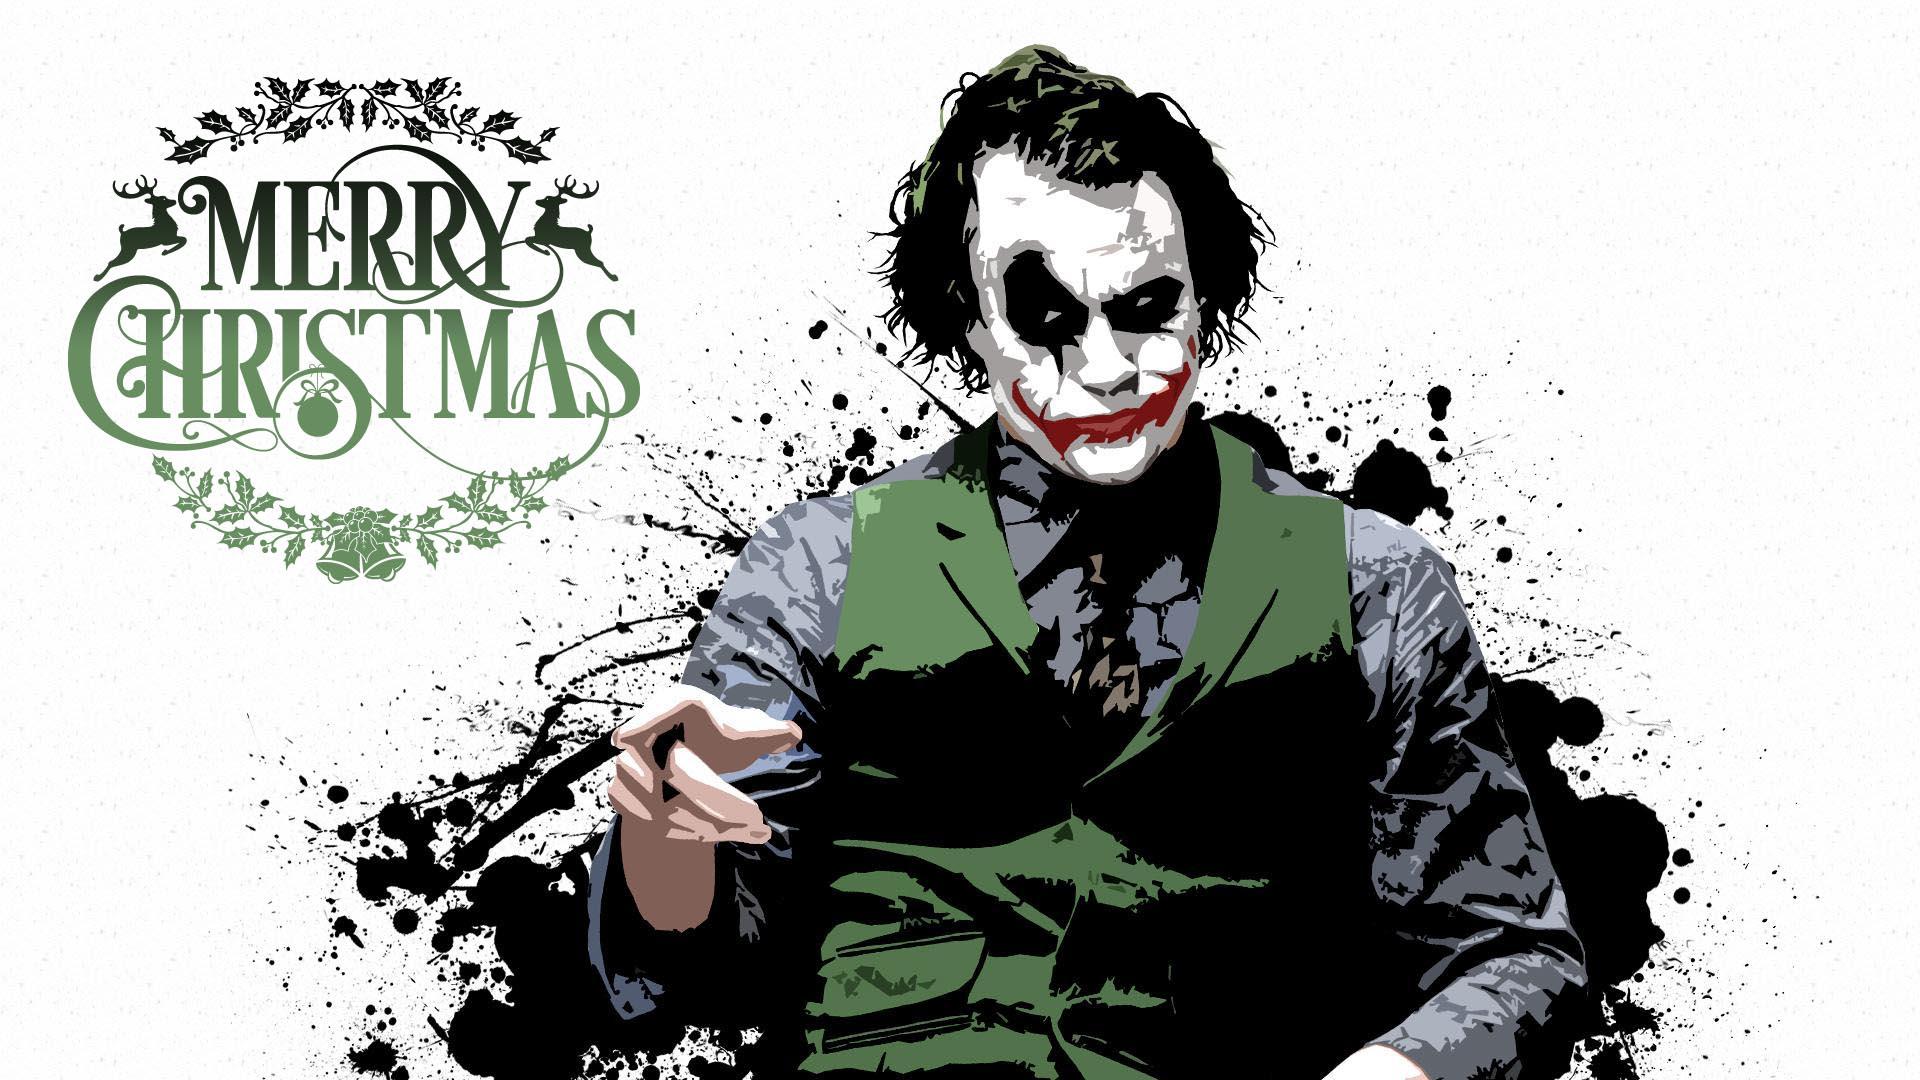 happy merry christmas wishes greetings joker hd desktop wallpaper